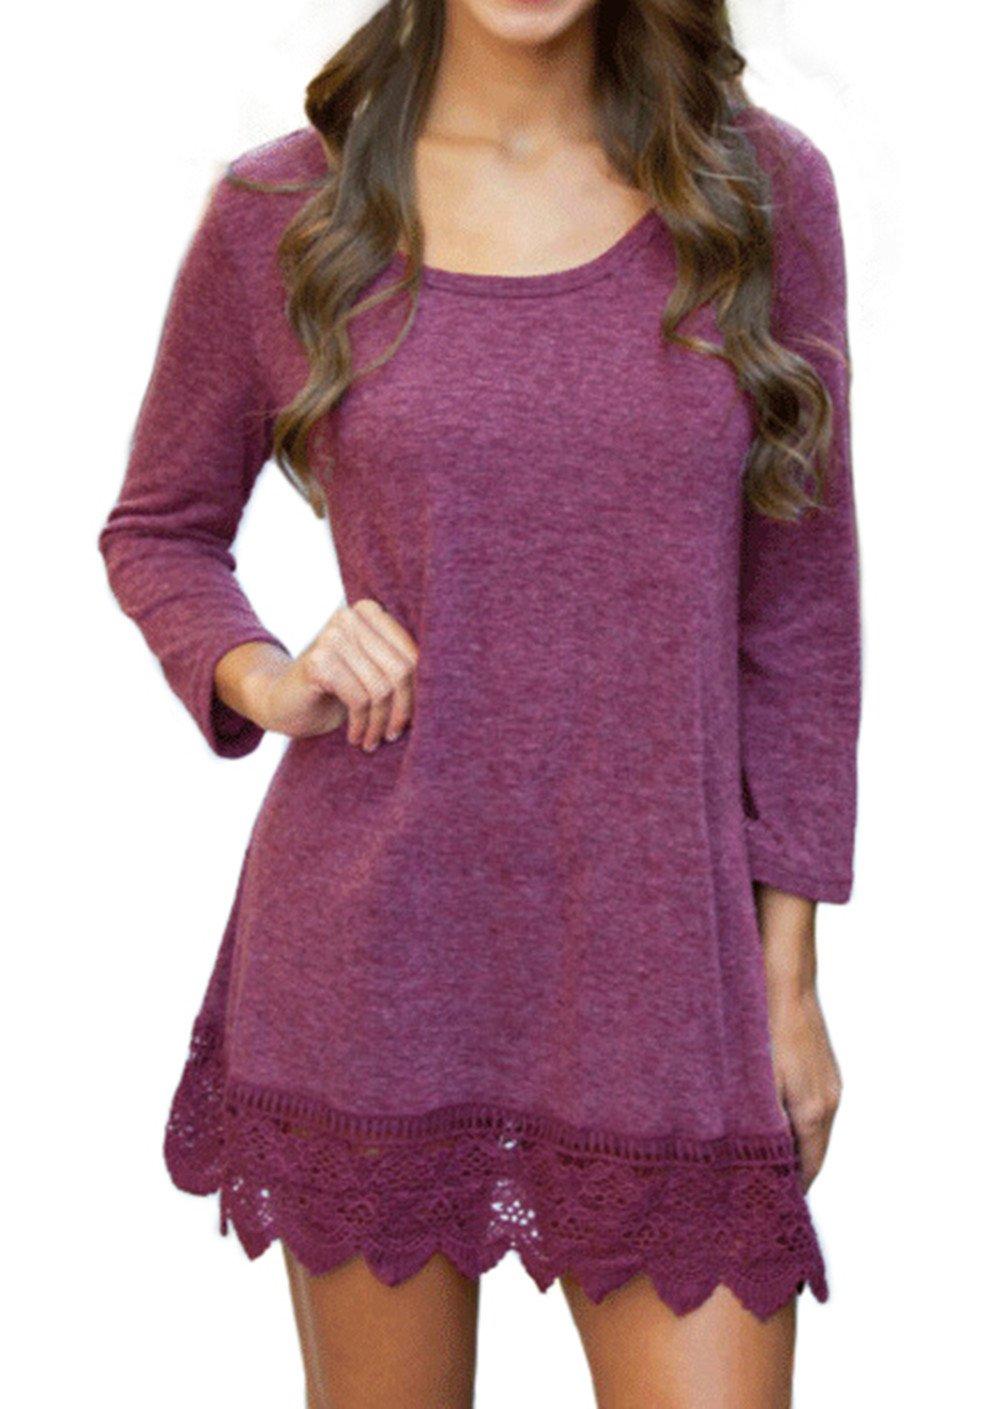 POZON Women's Casual Long Sleeve Simple T-Shirt Loose Dress (M, Purplish Red)